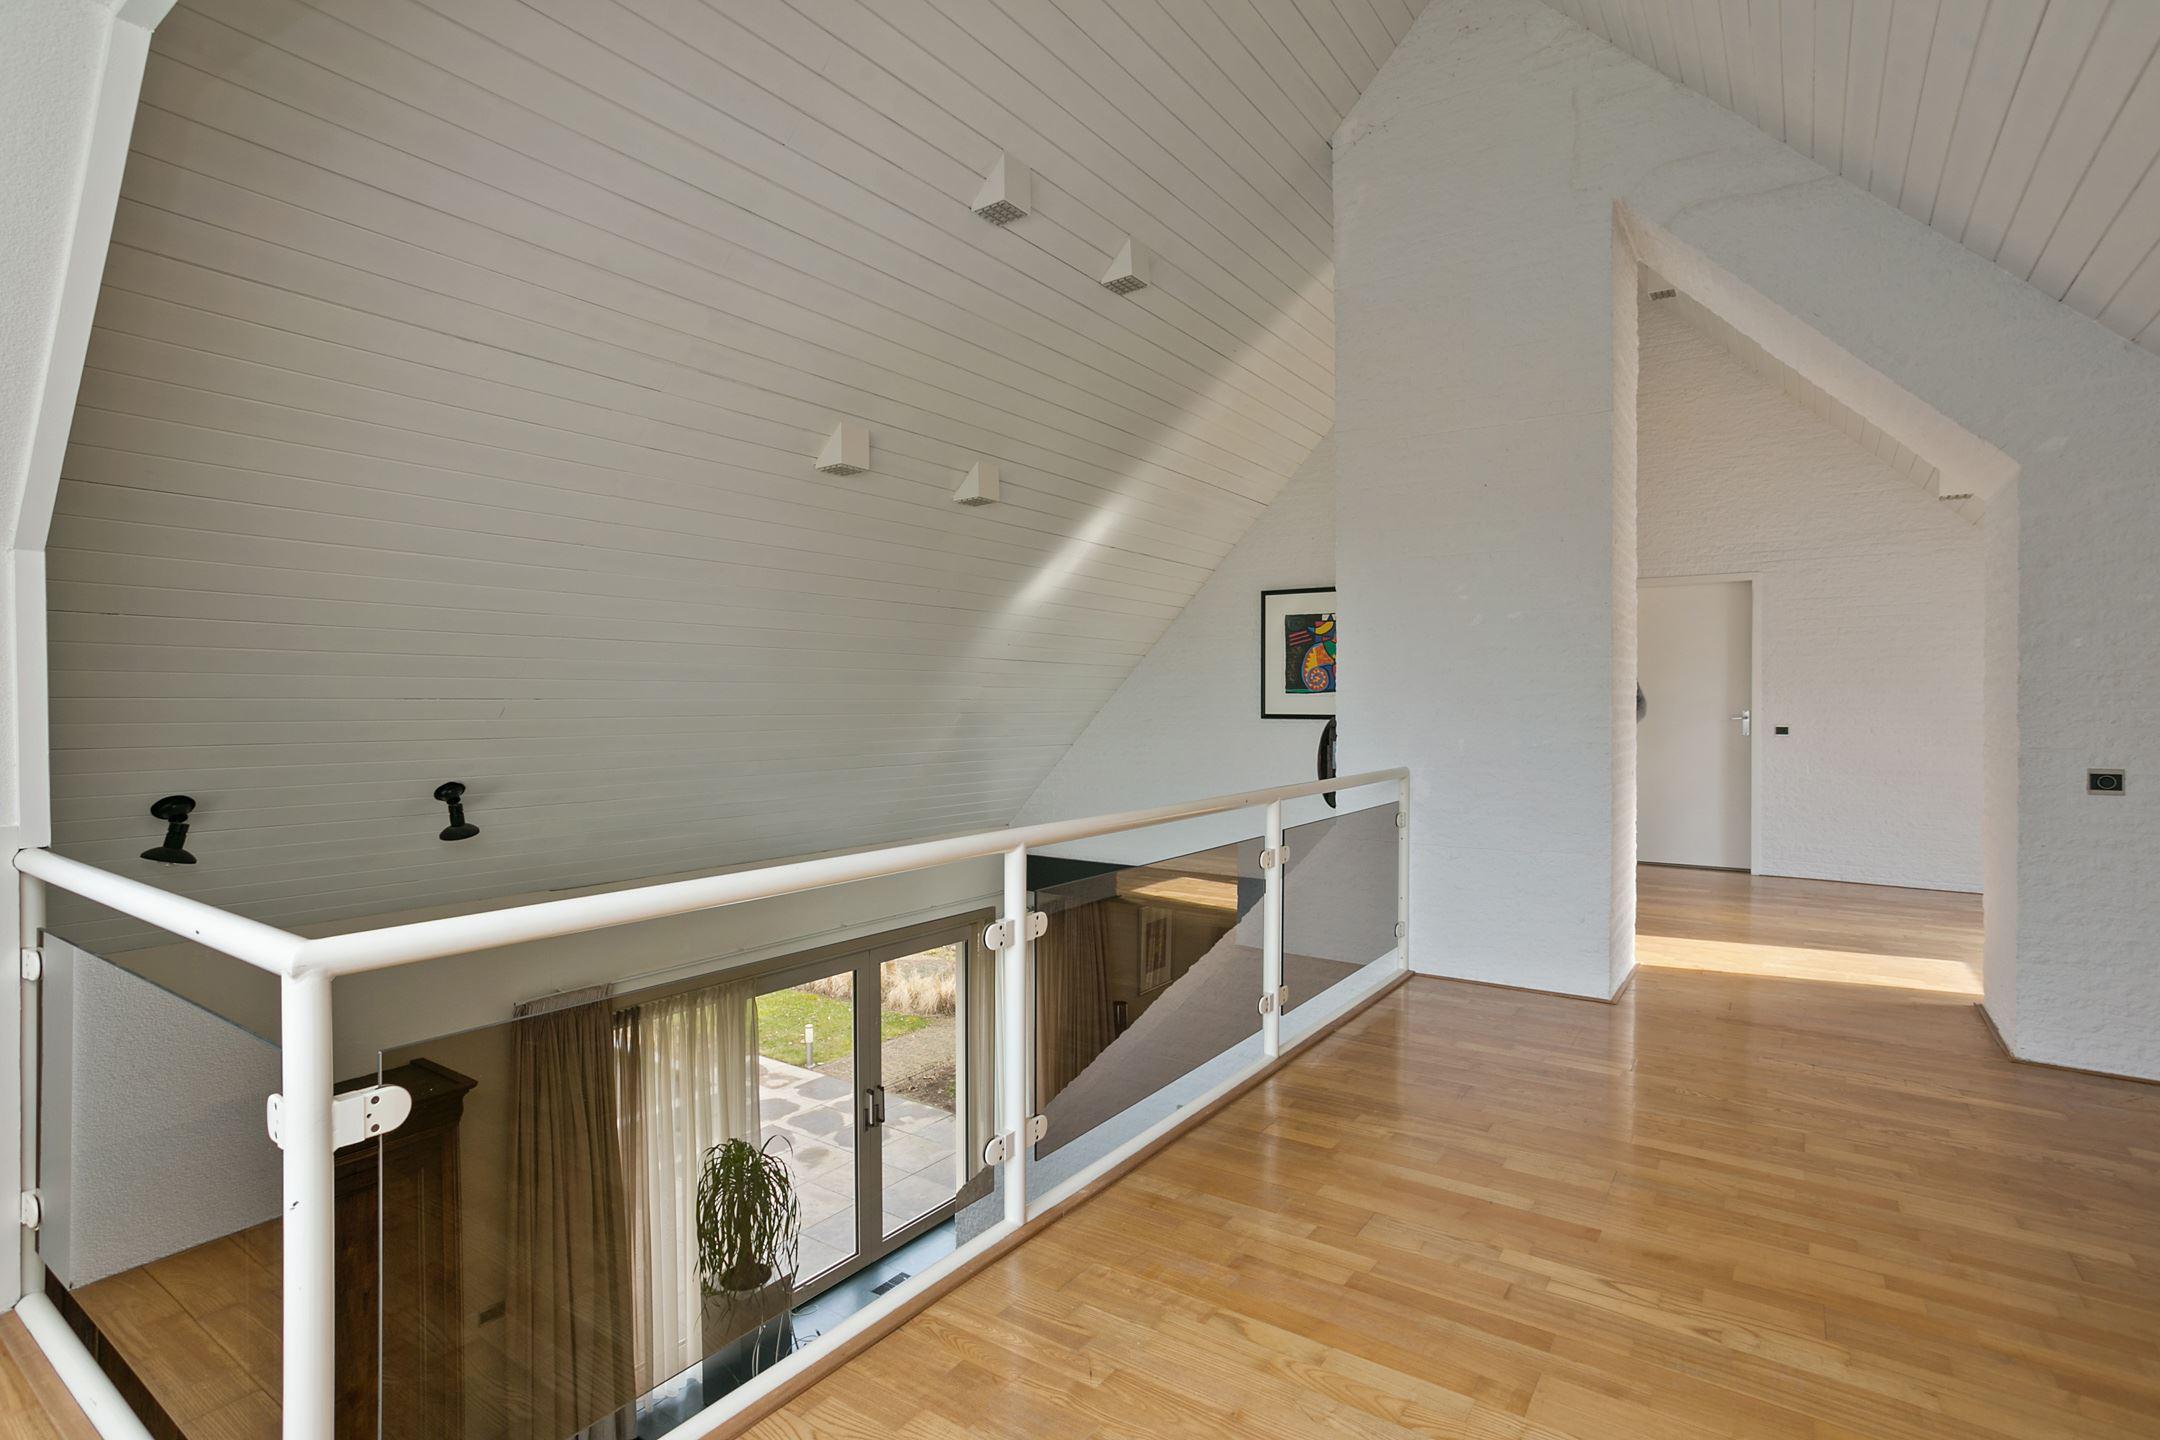 Niveauverschil In Huis : Niveauverschil passiefhuis lokeren